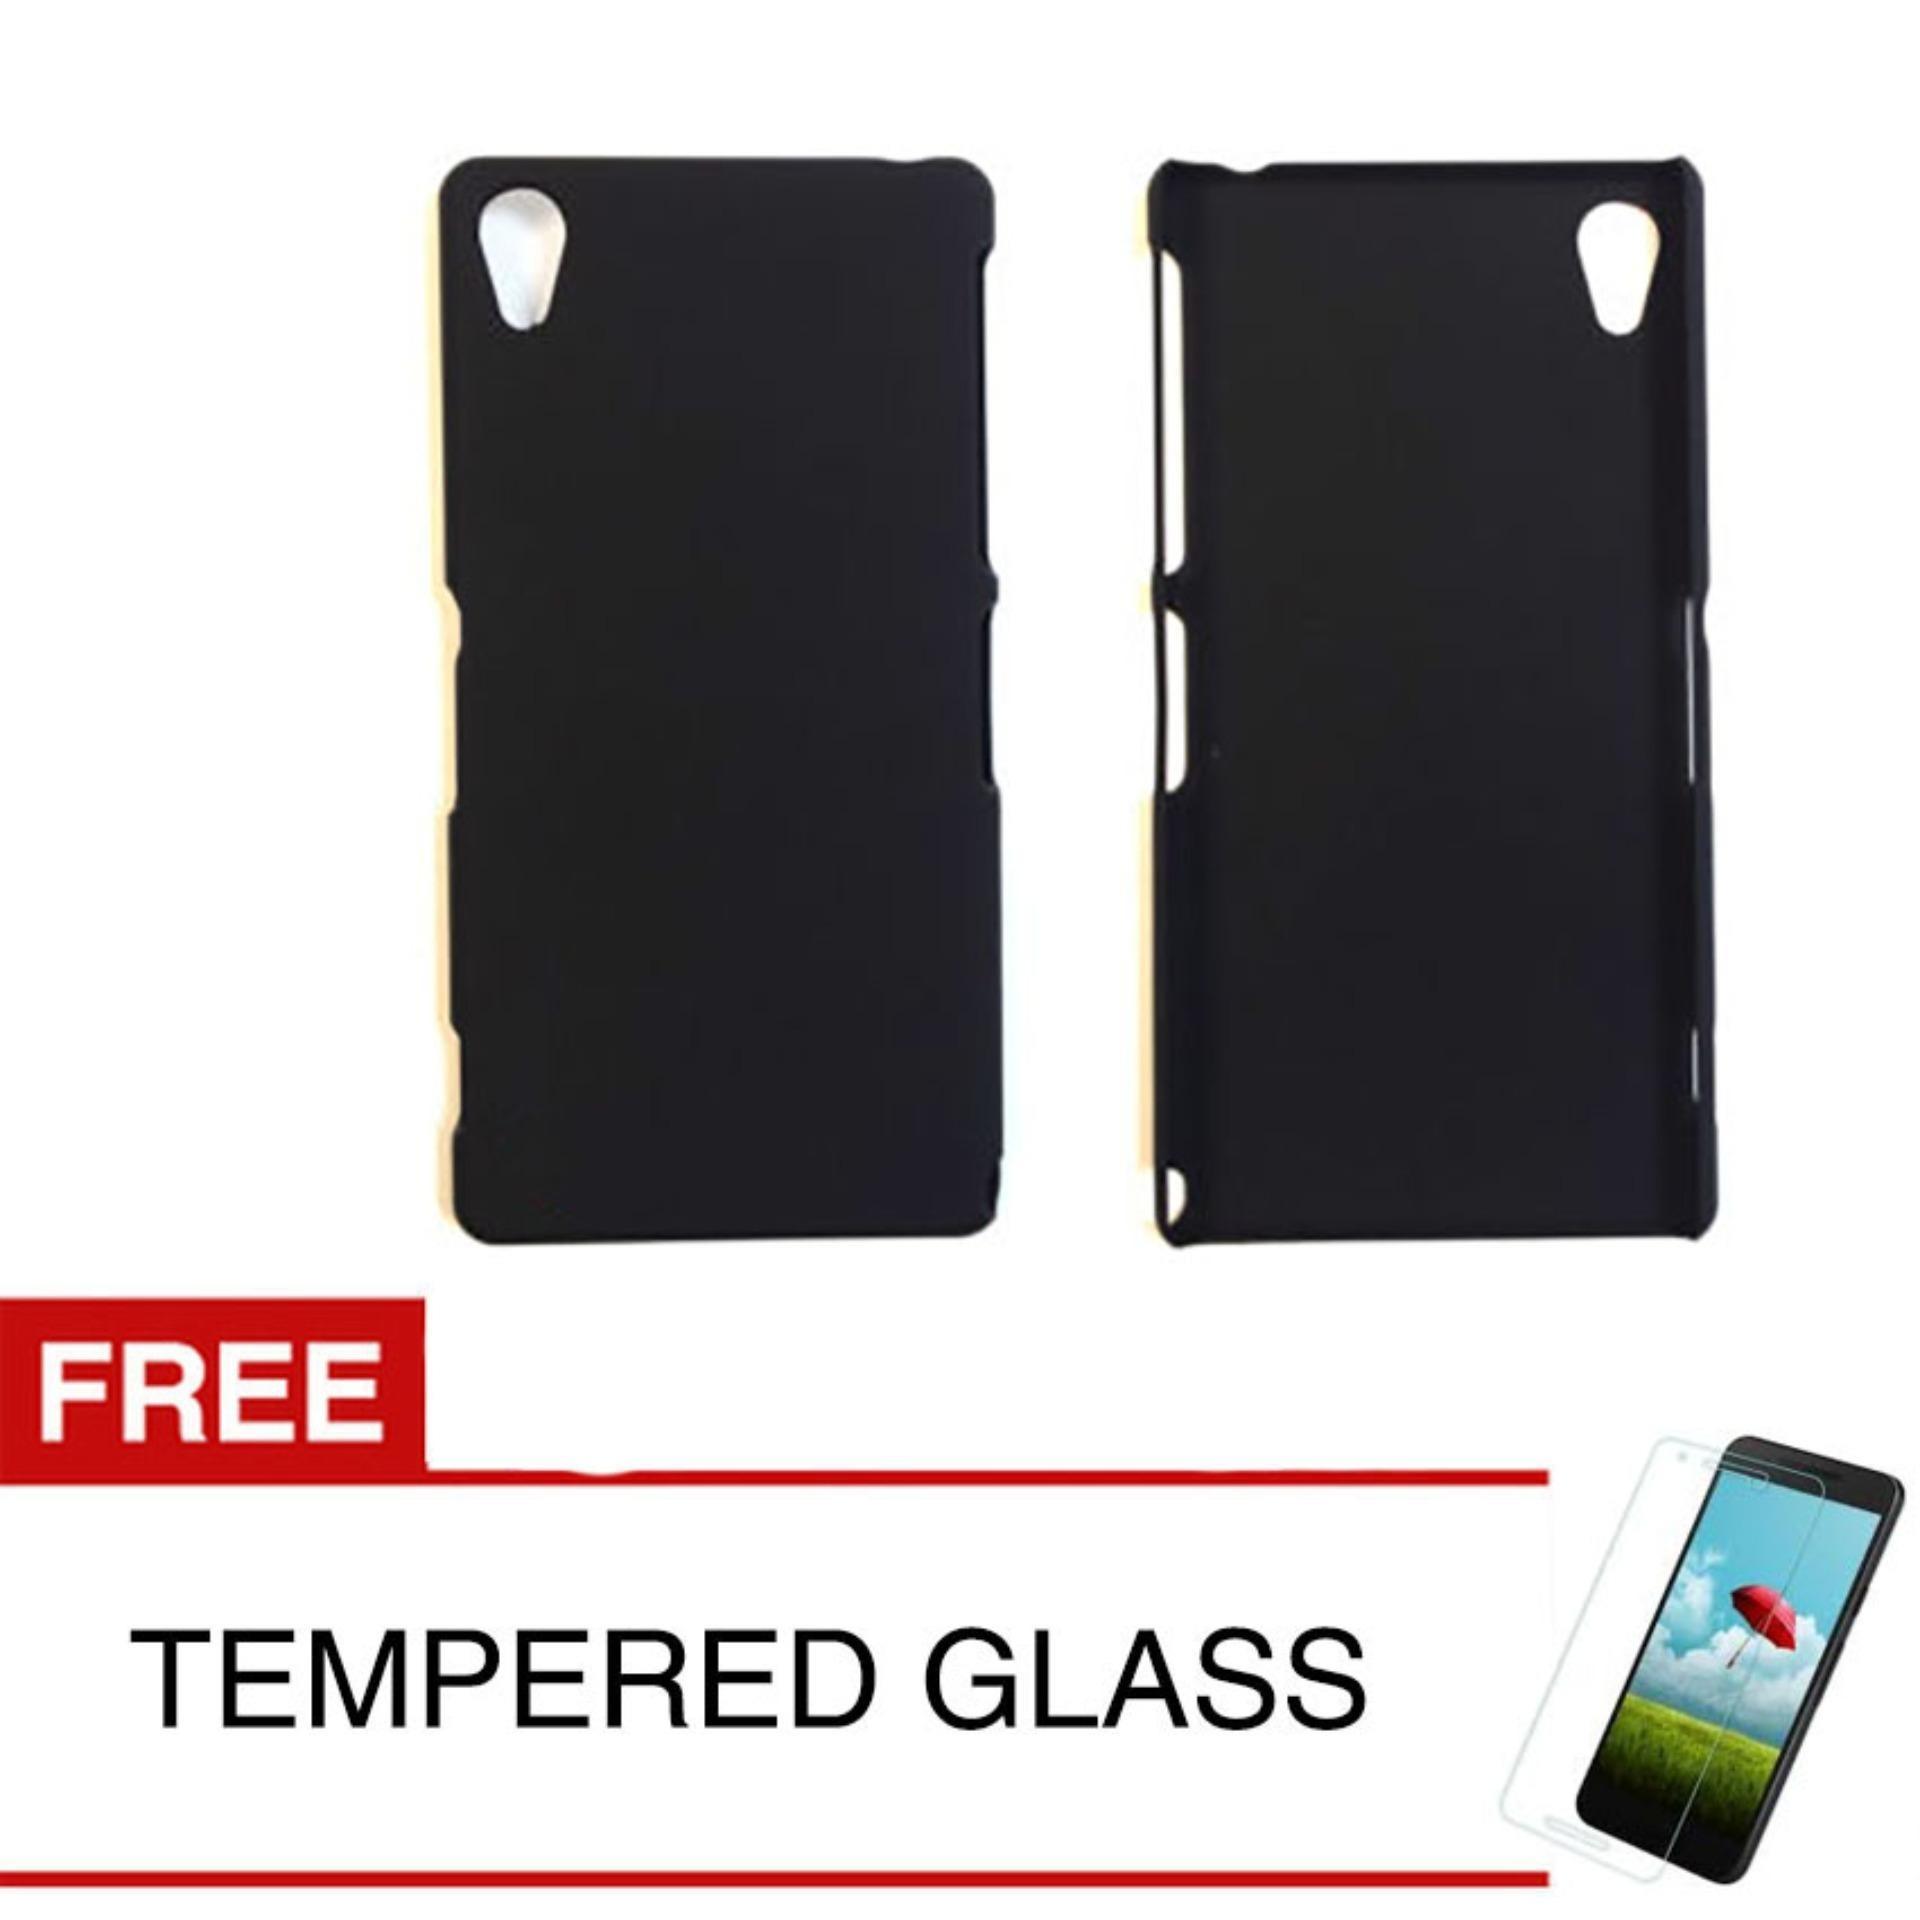 Case Slim Black Matte Sony Xperia Z2 - Black Doff - Free Tempered Glass